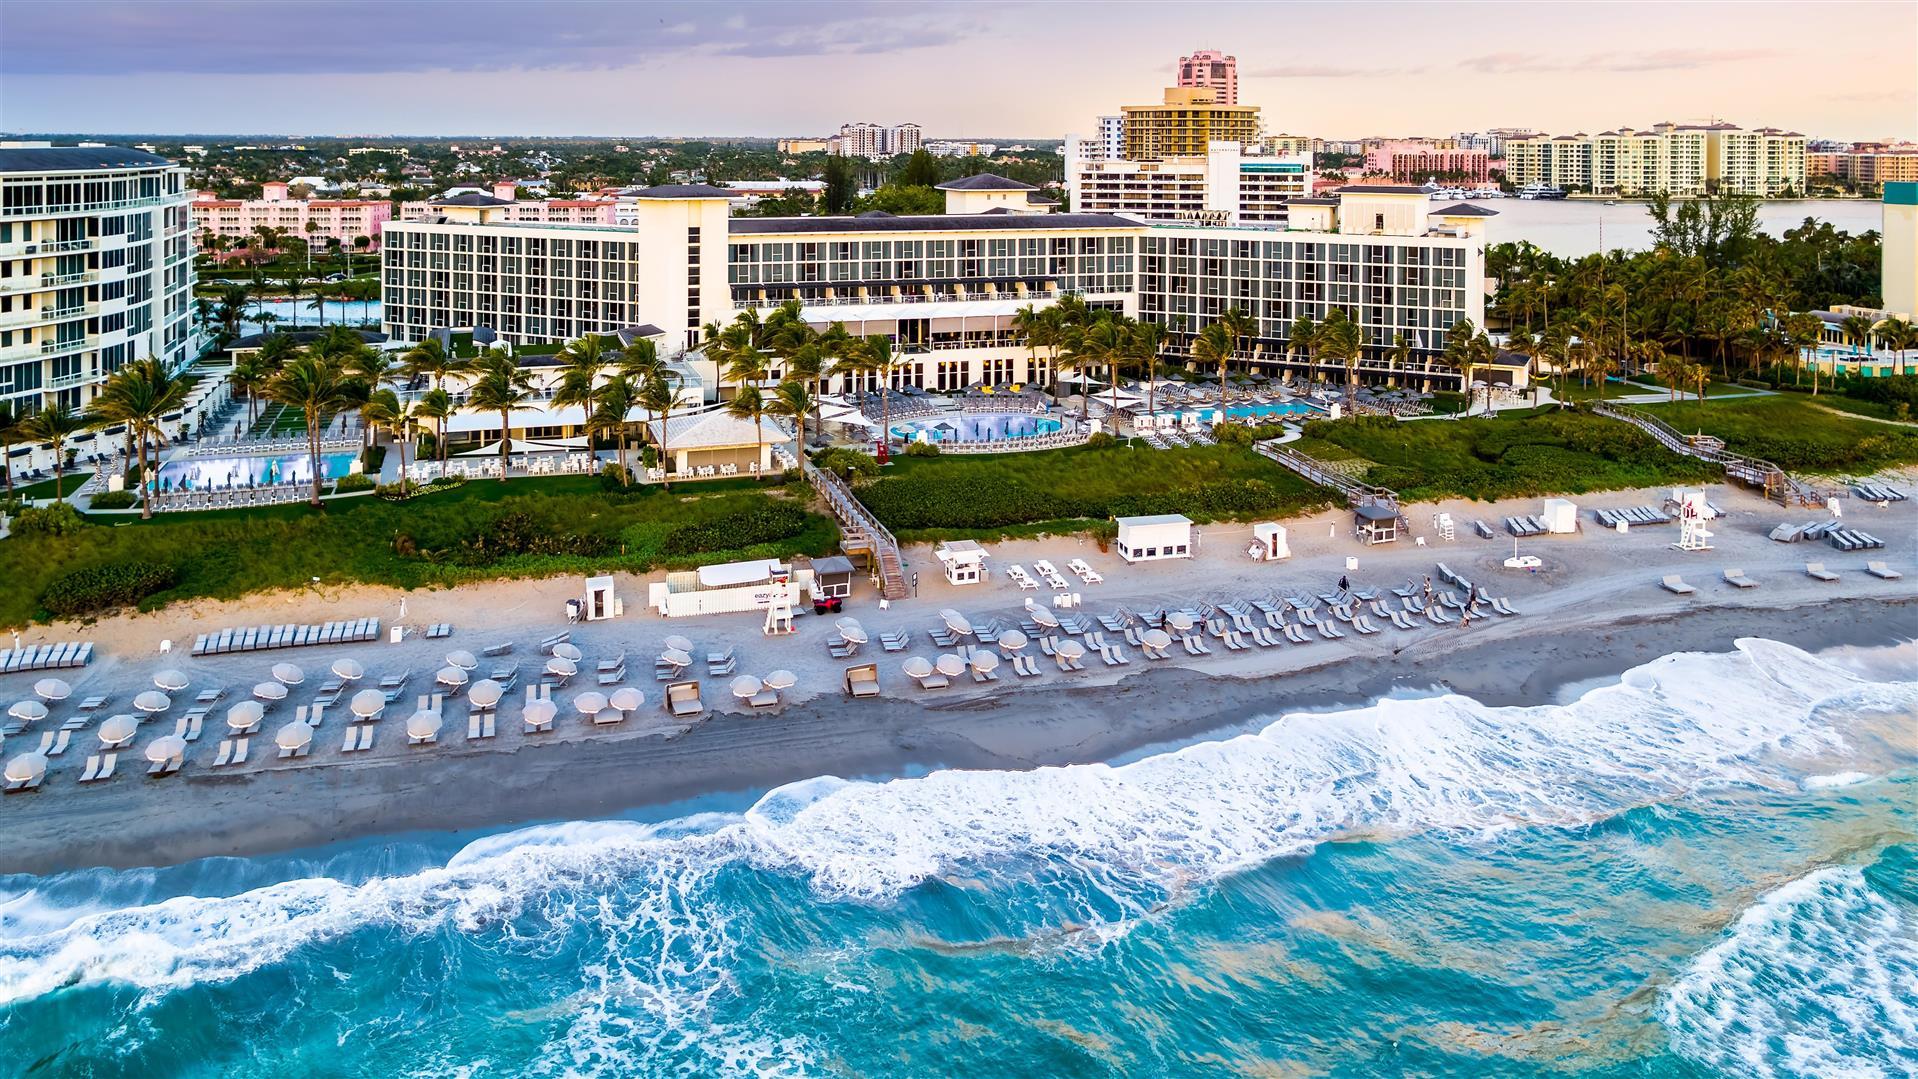 Boca Raton Resort & Club, Boca Raton, Florida